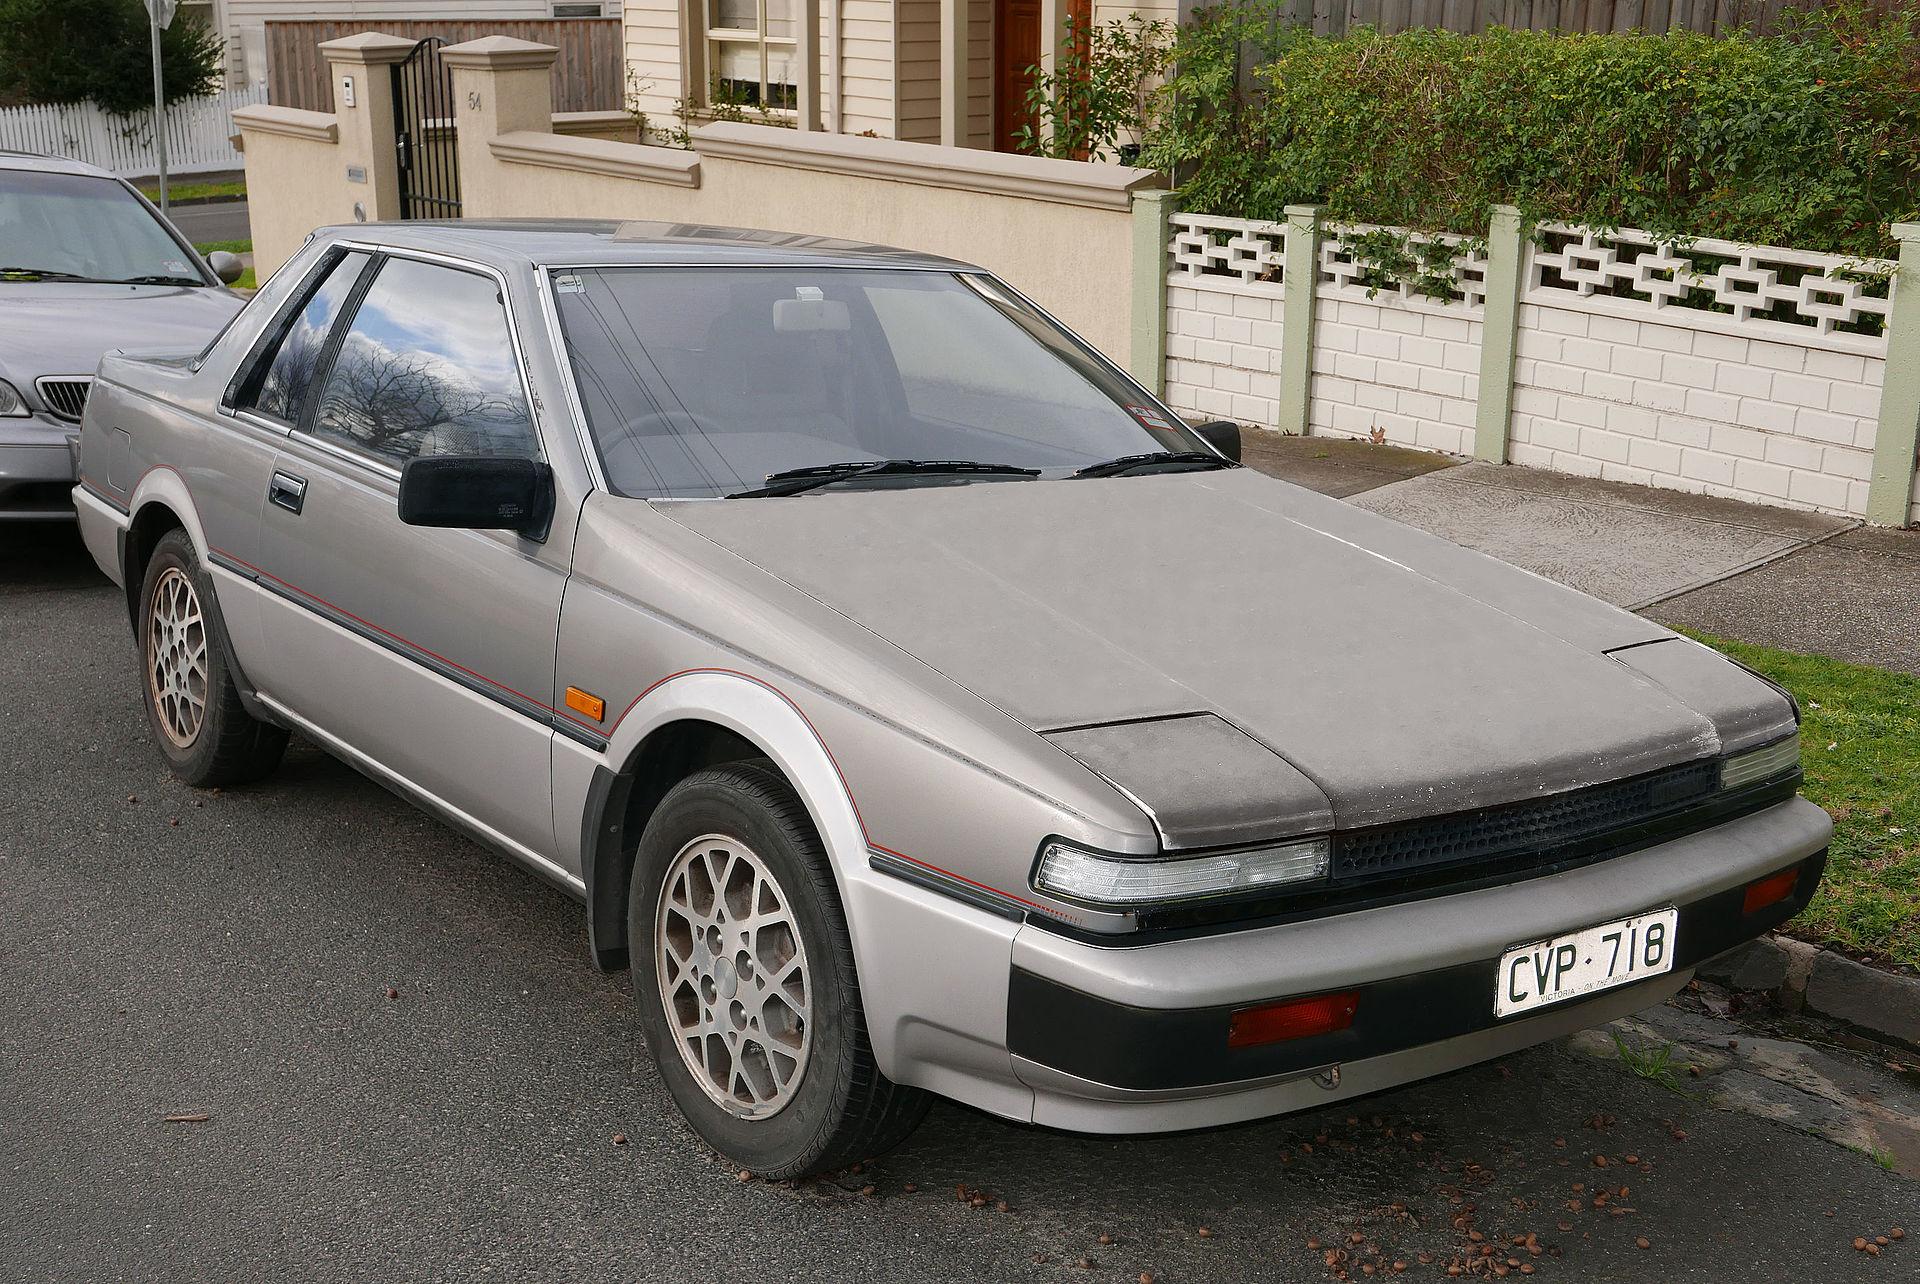 Nissan Silvia IV (S12) 1983 - 1988 Coupe #6